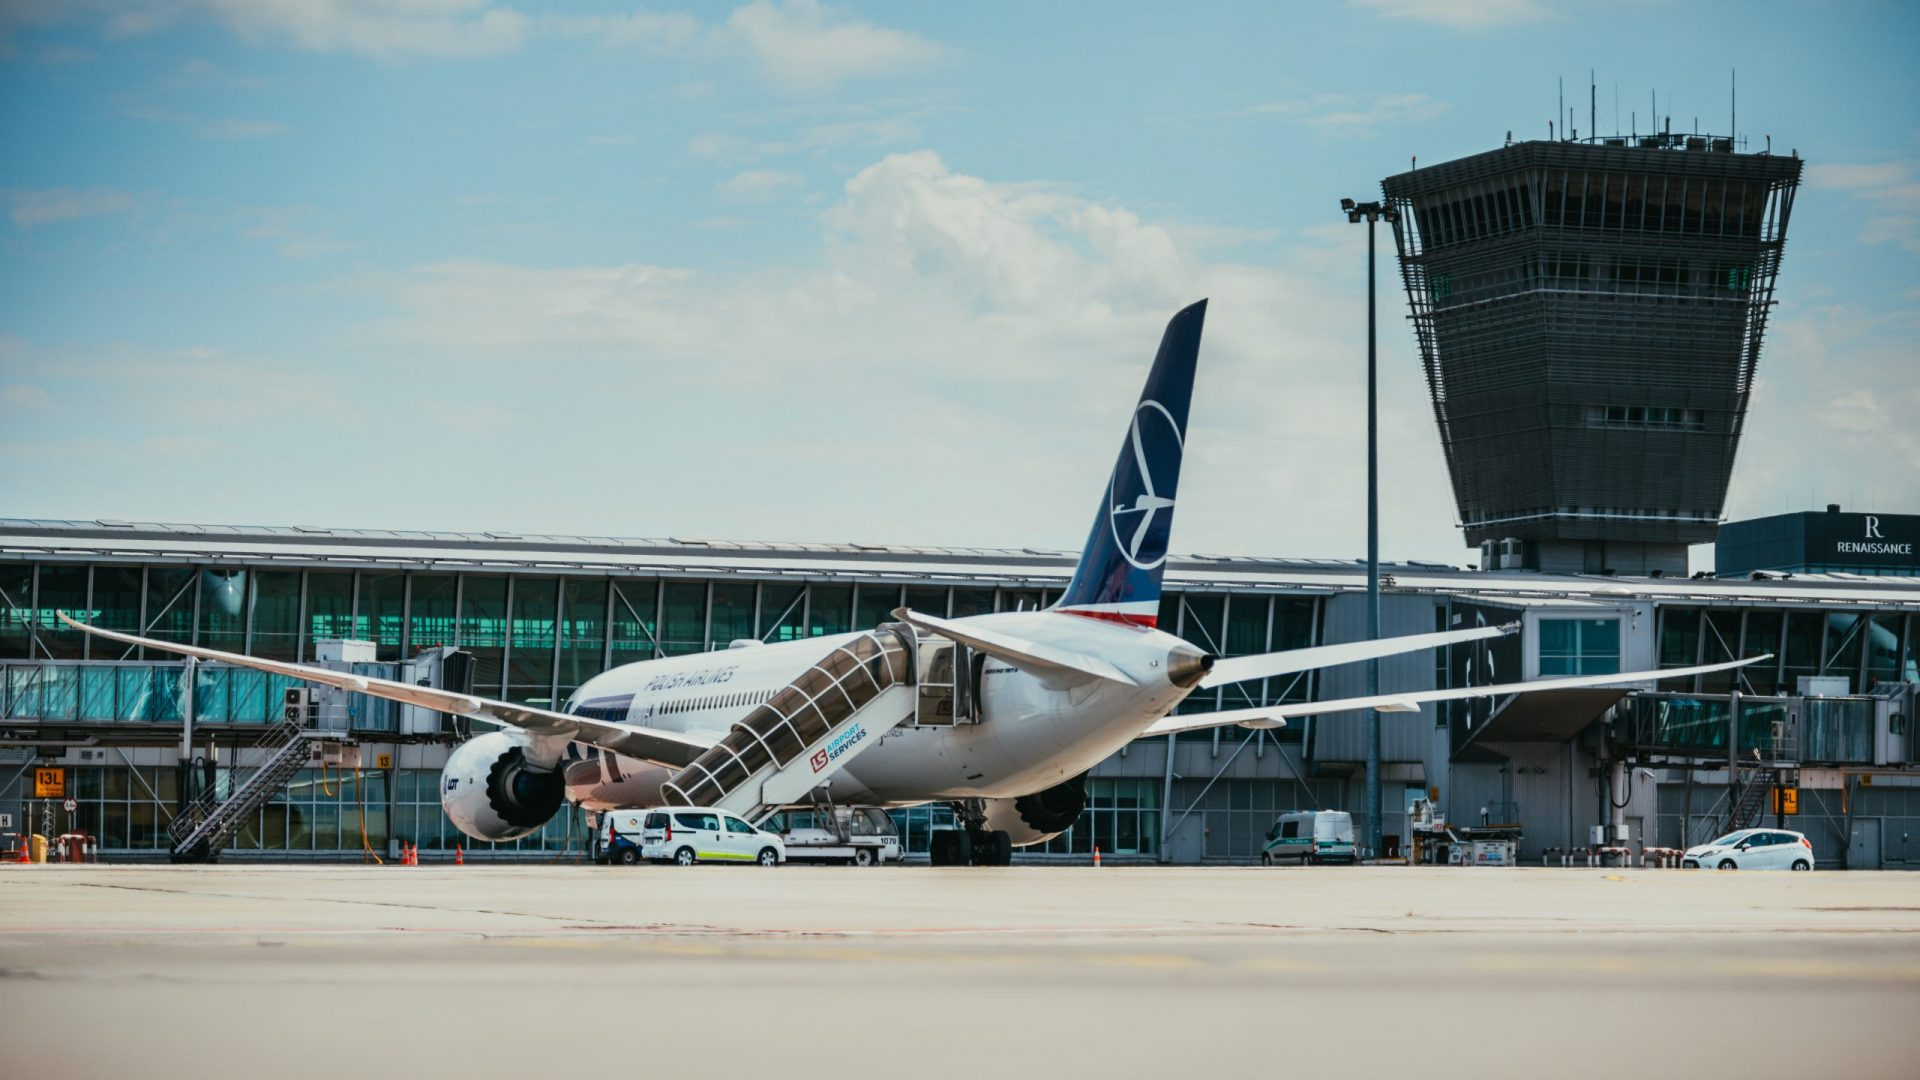 LOT Polish Airlines by Oskar Kadaksoo